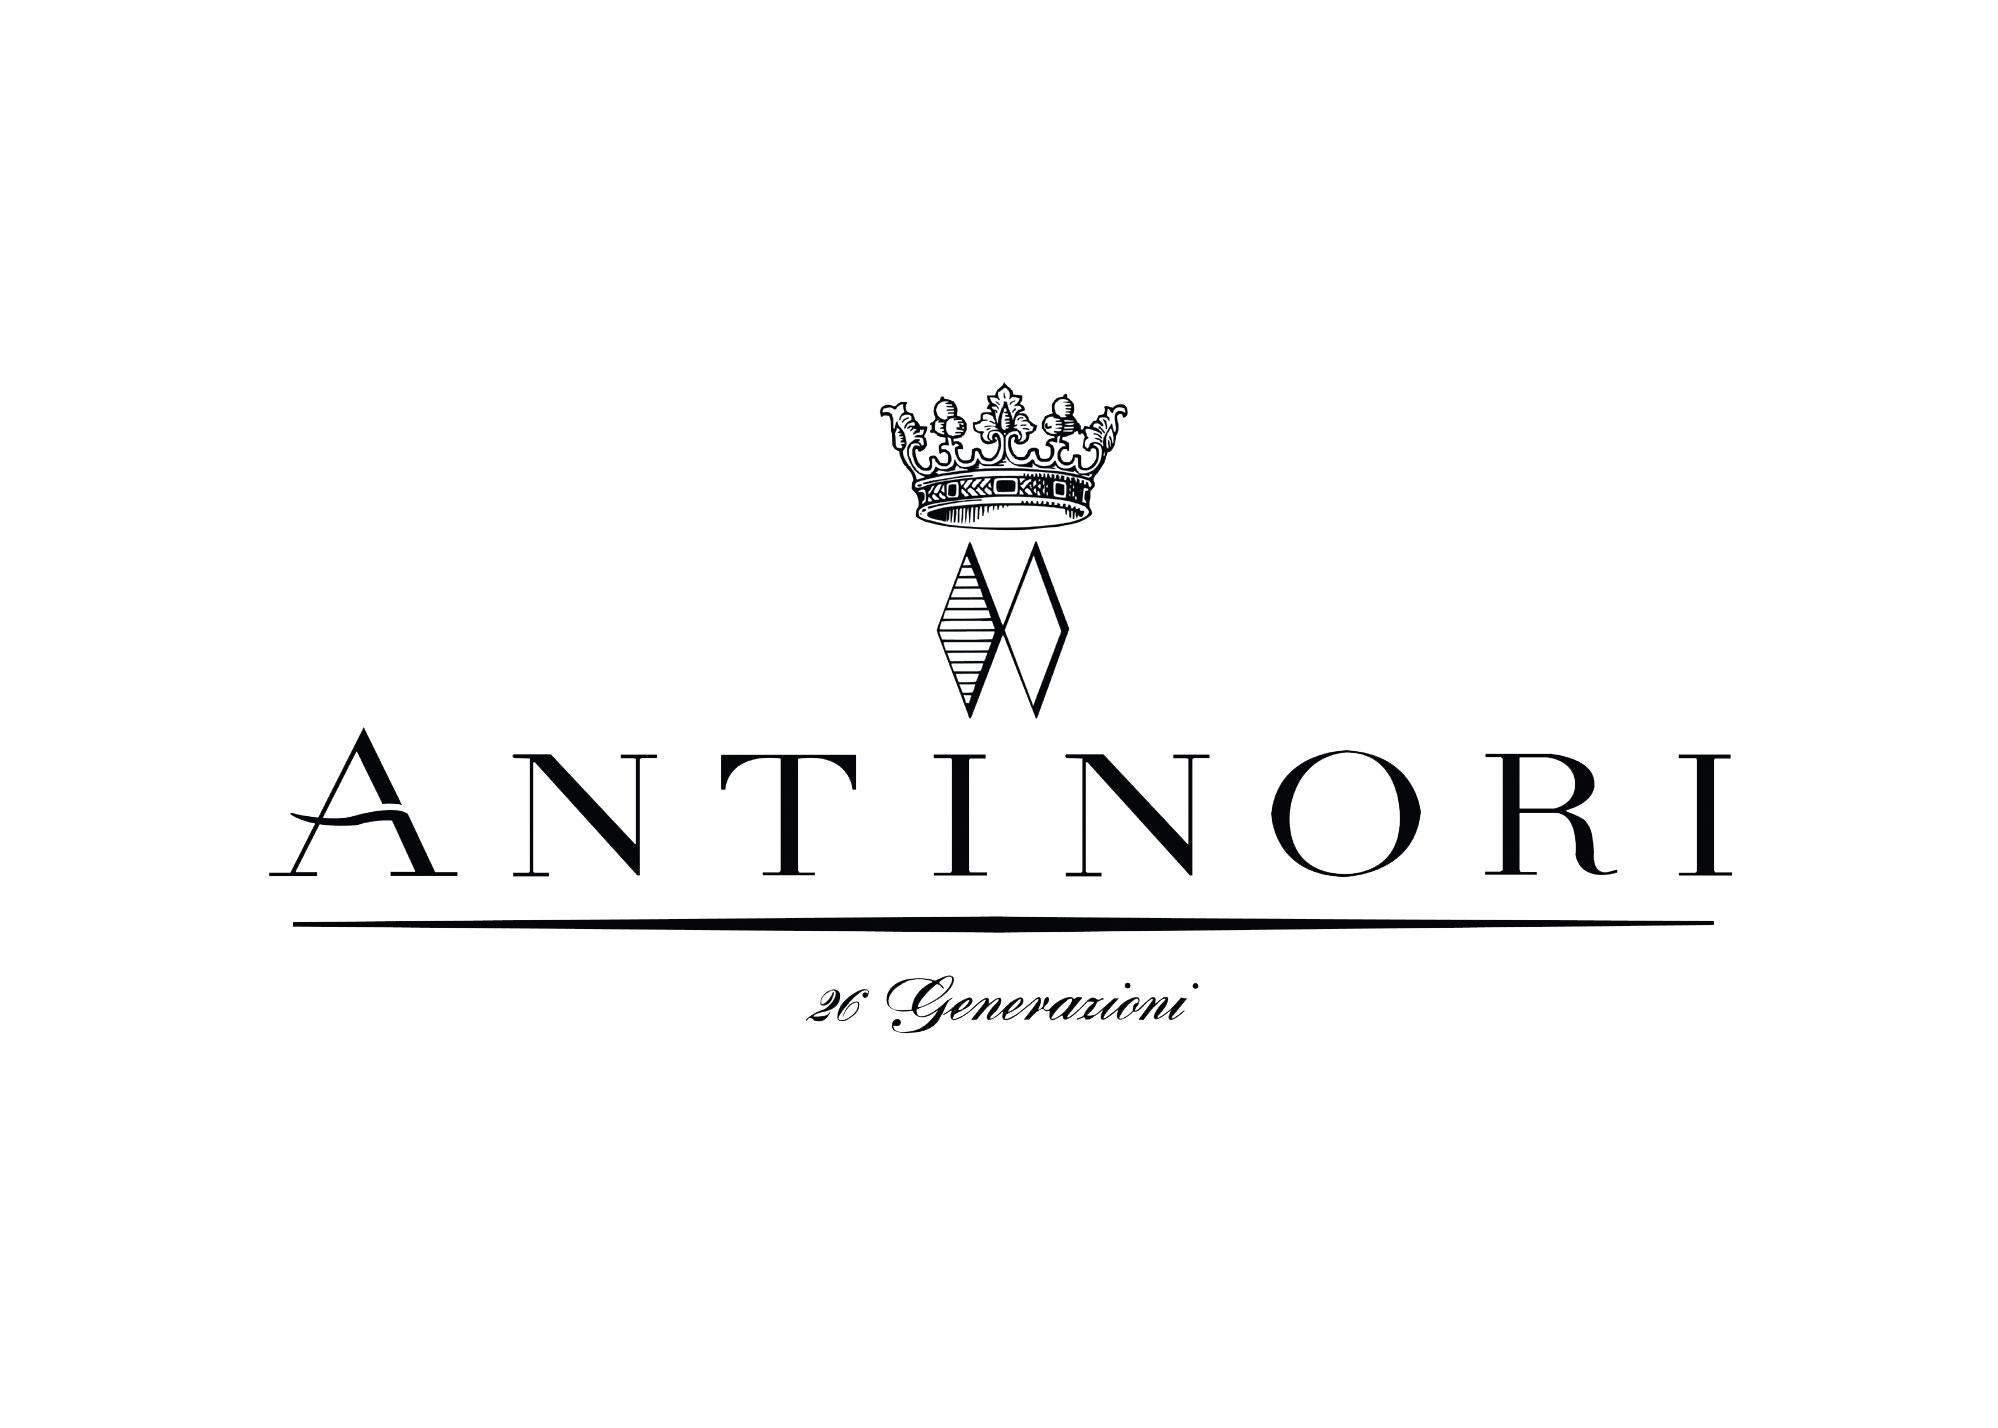 Antinori-logo